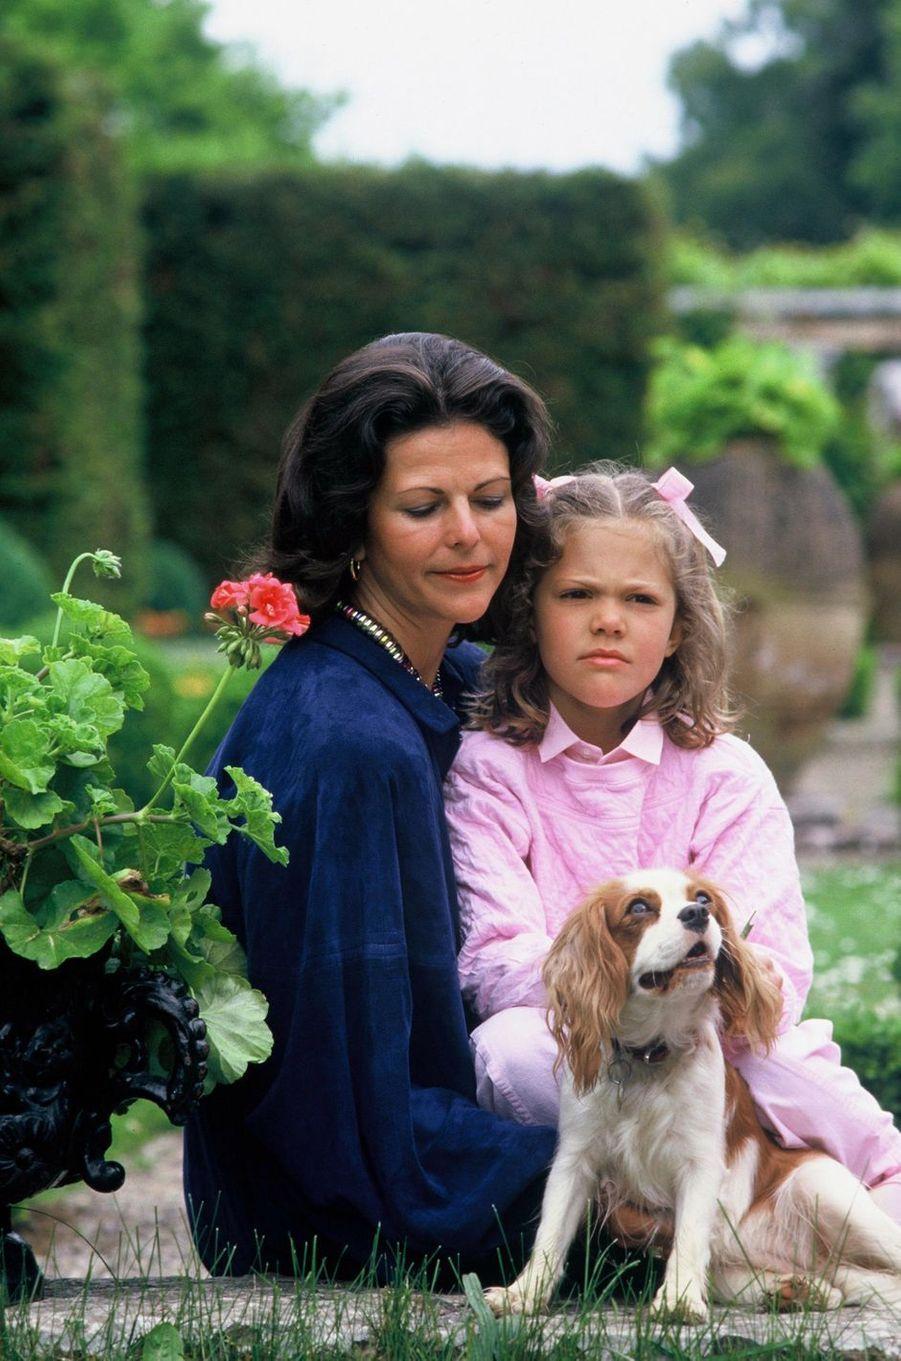 La reine Silvia de Suède avec la princesse Victoria, en juillet 1985